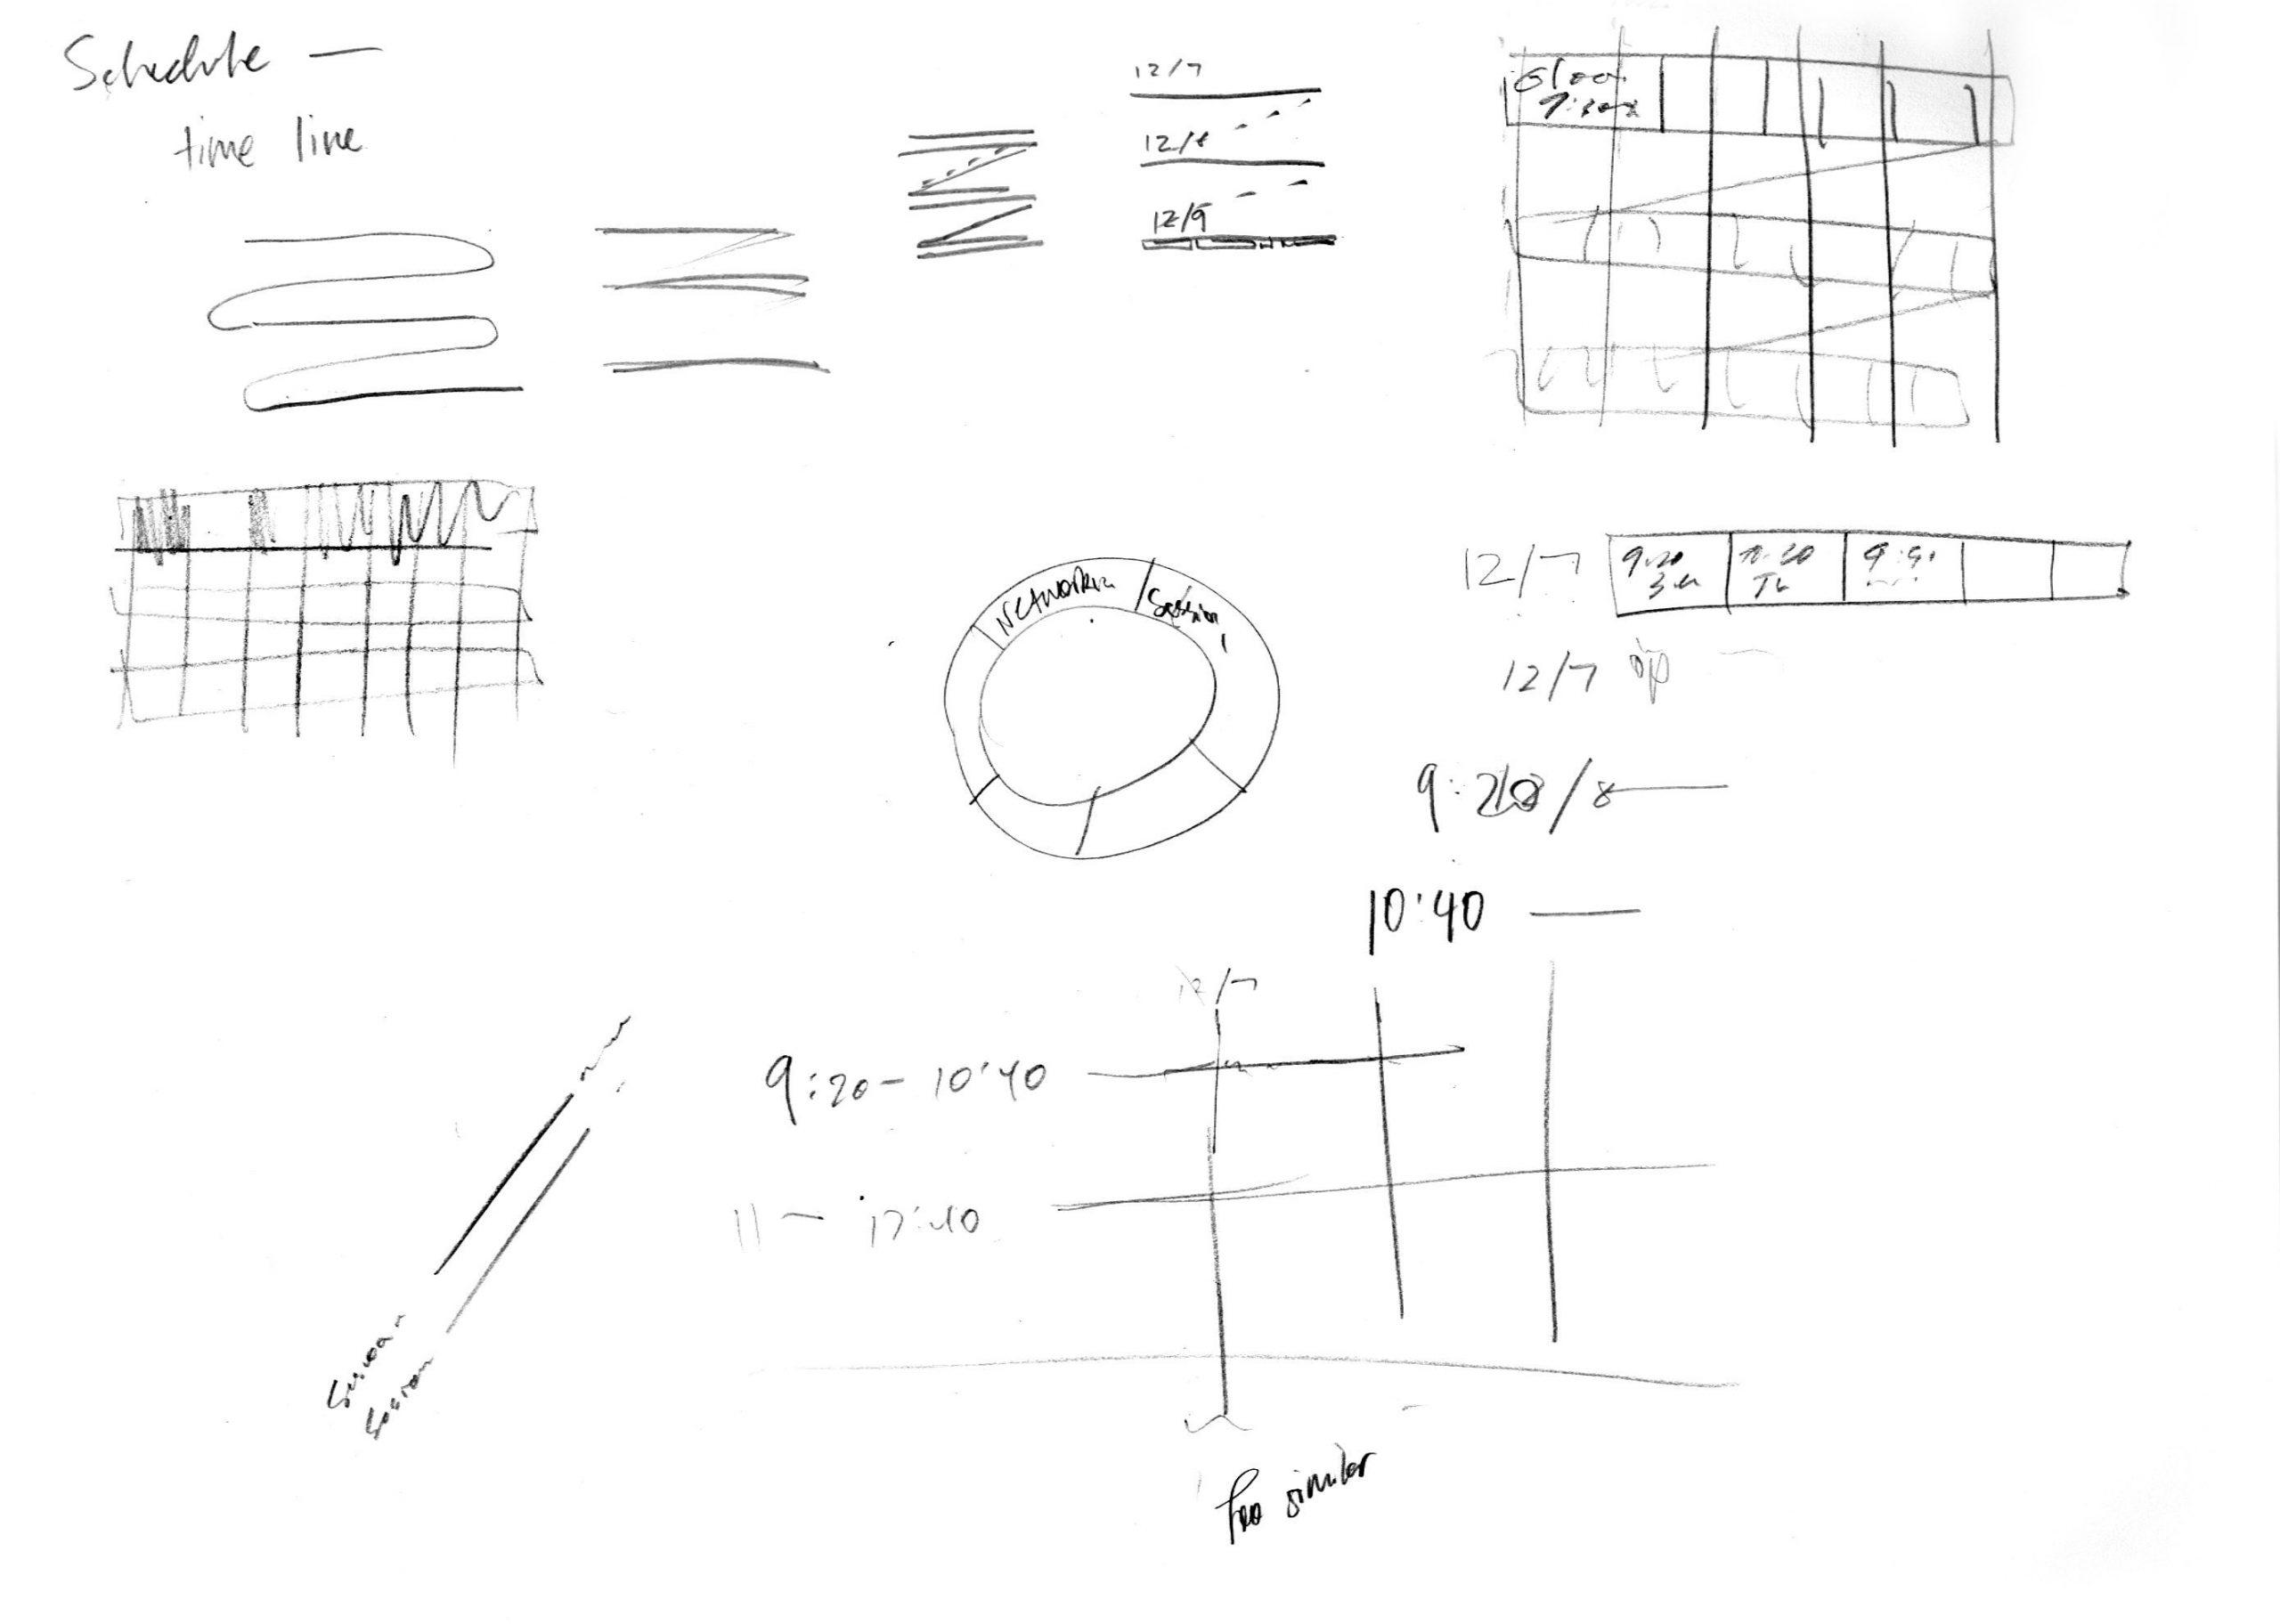 GalvanizeSketches013